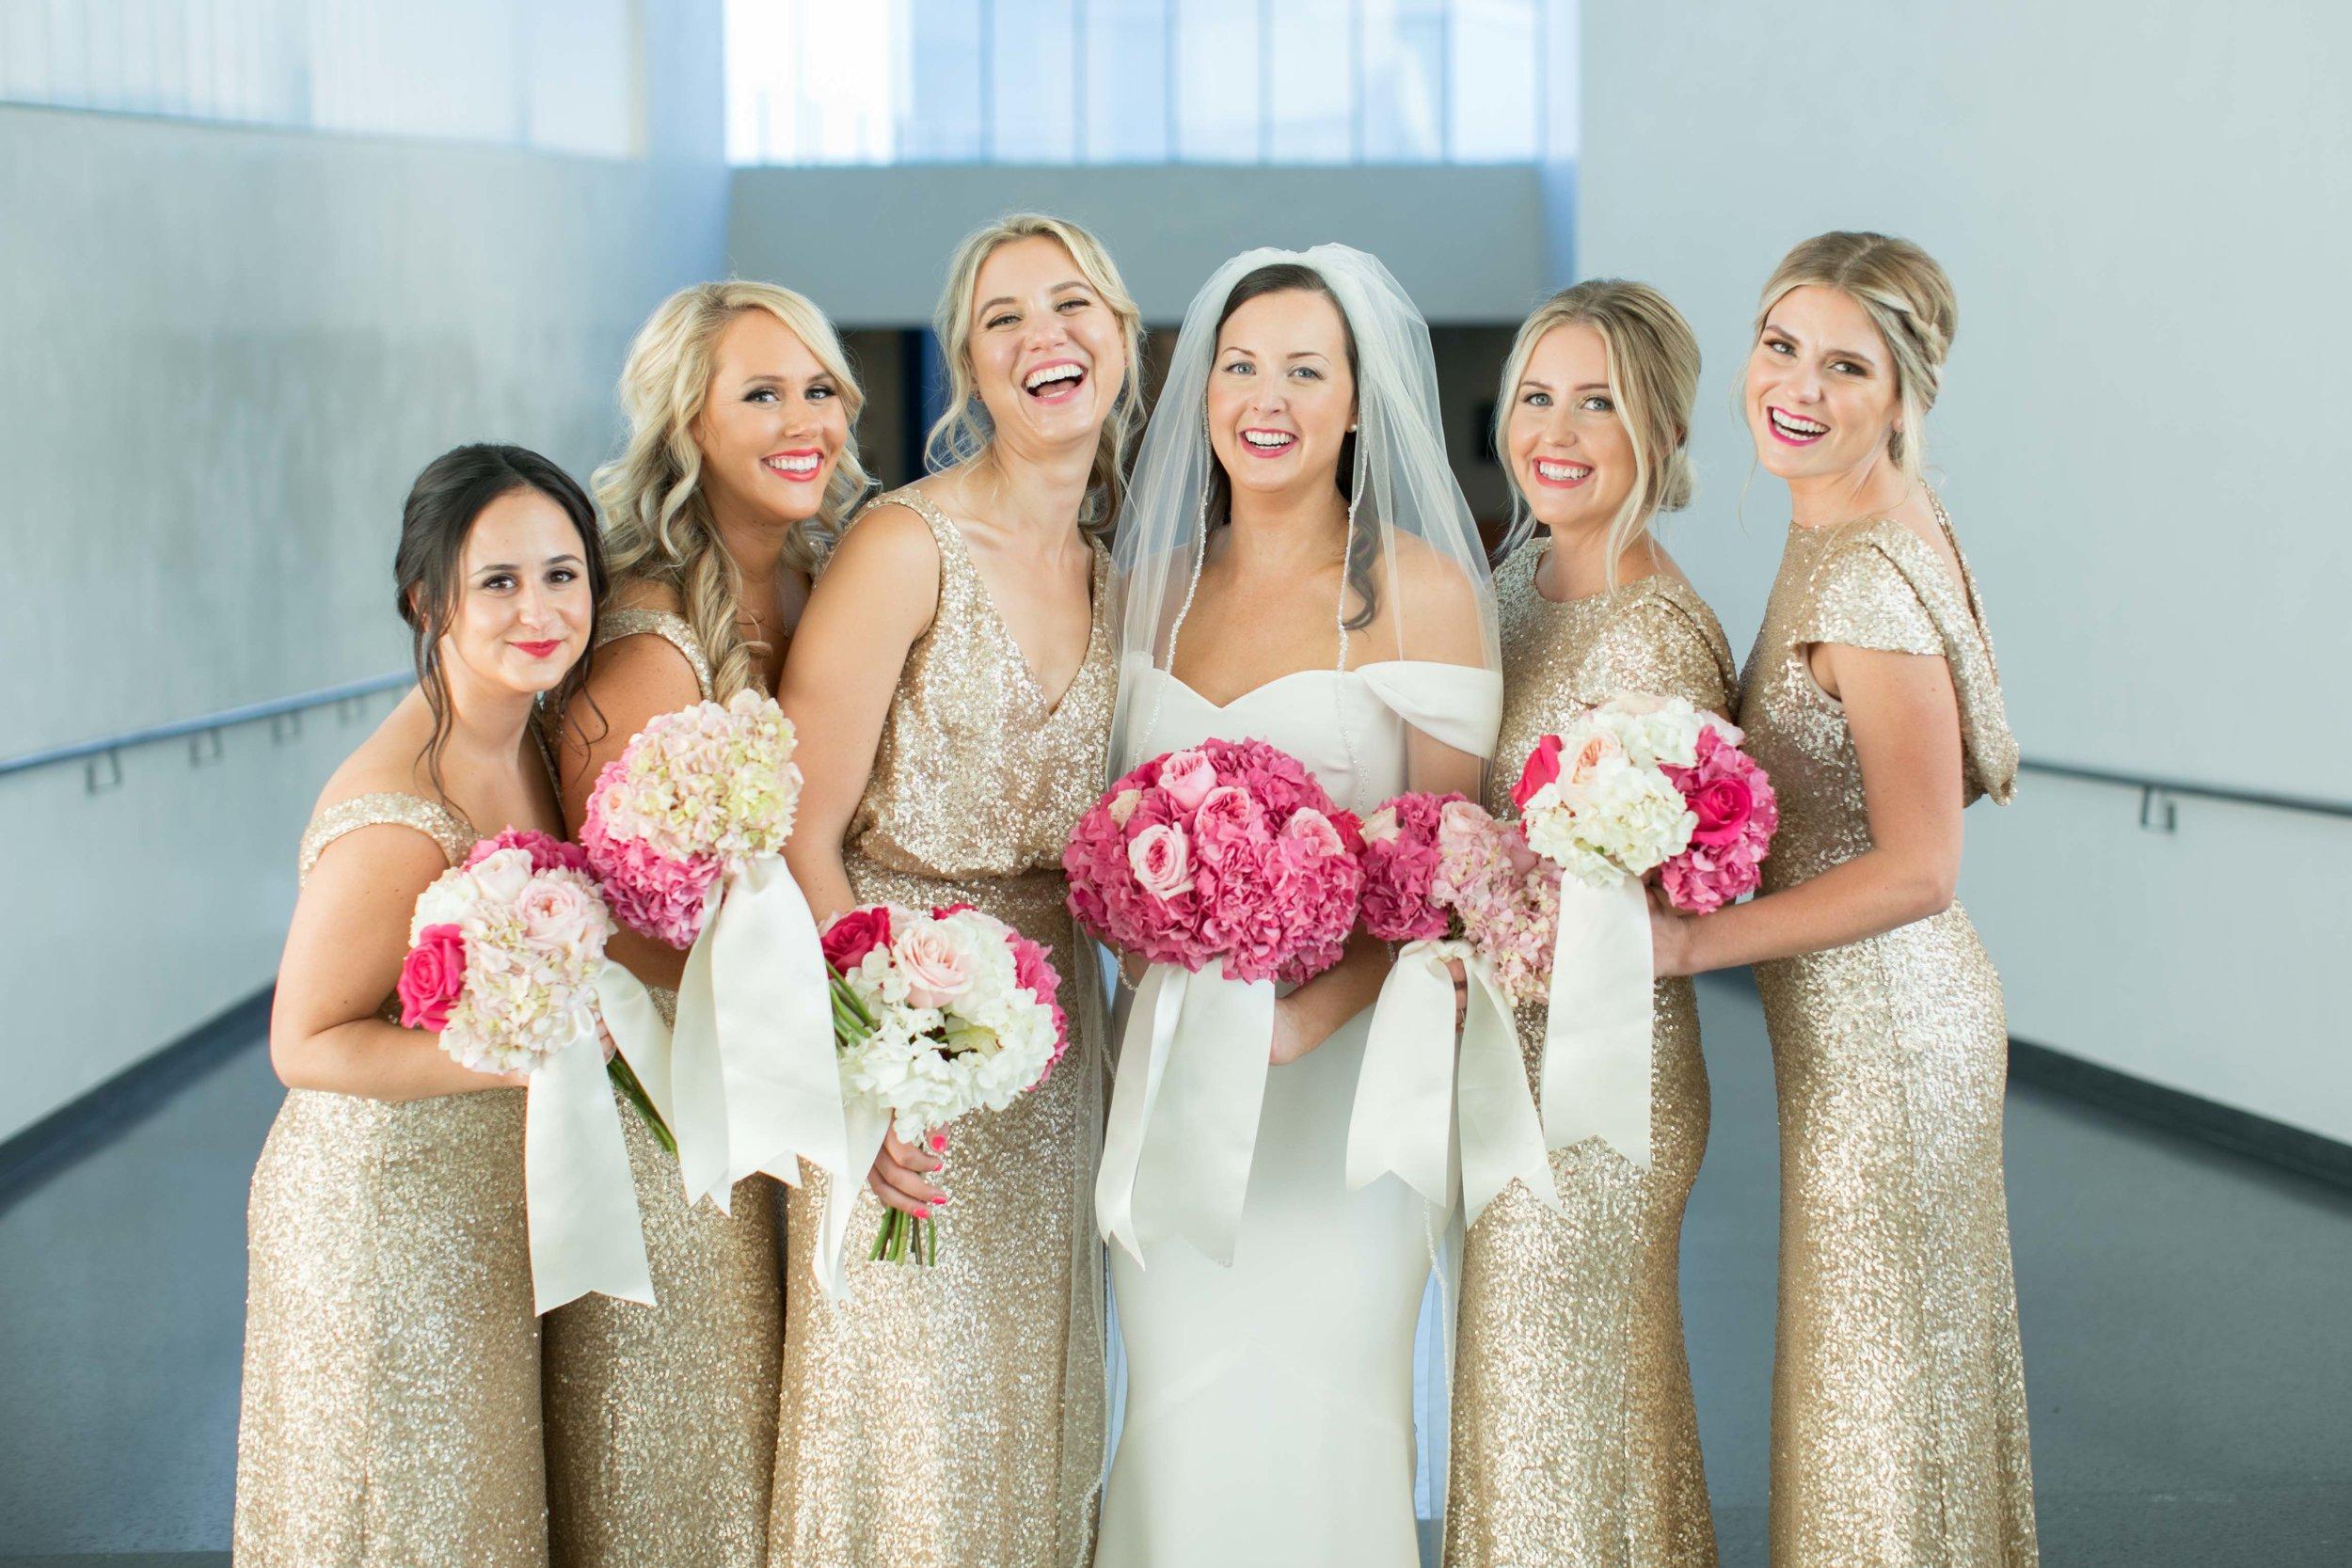 nelson-atkins-wedding-52.jpg